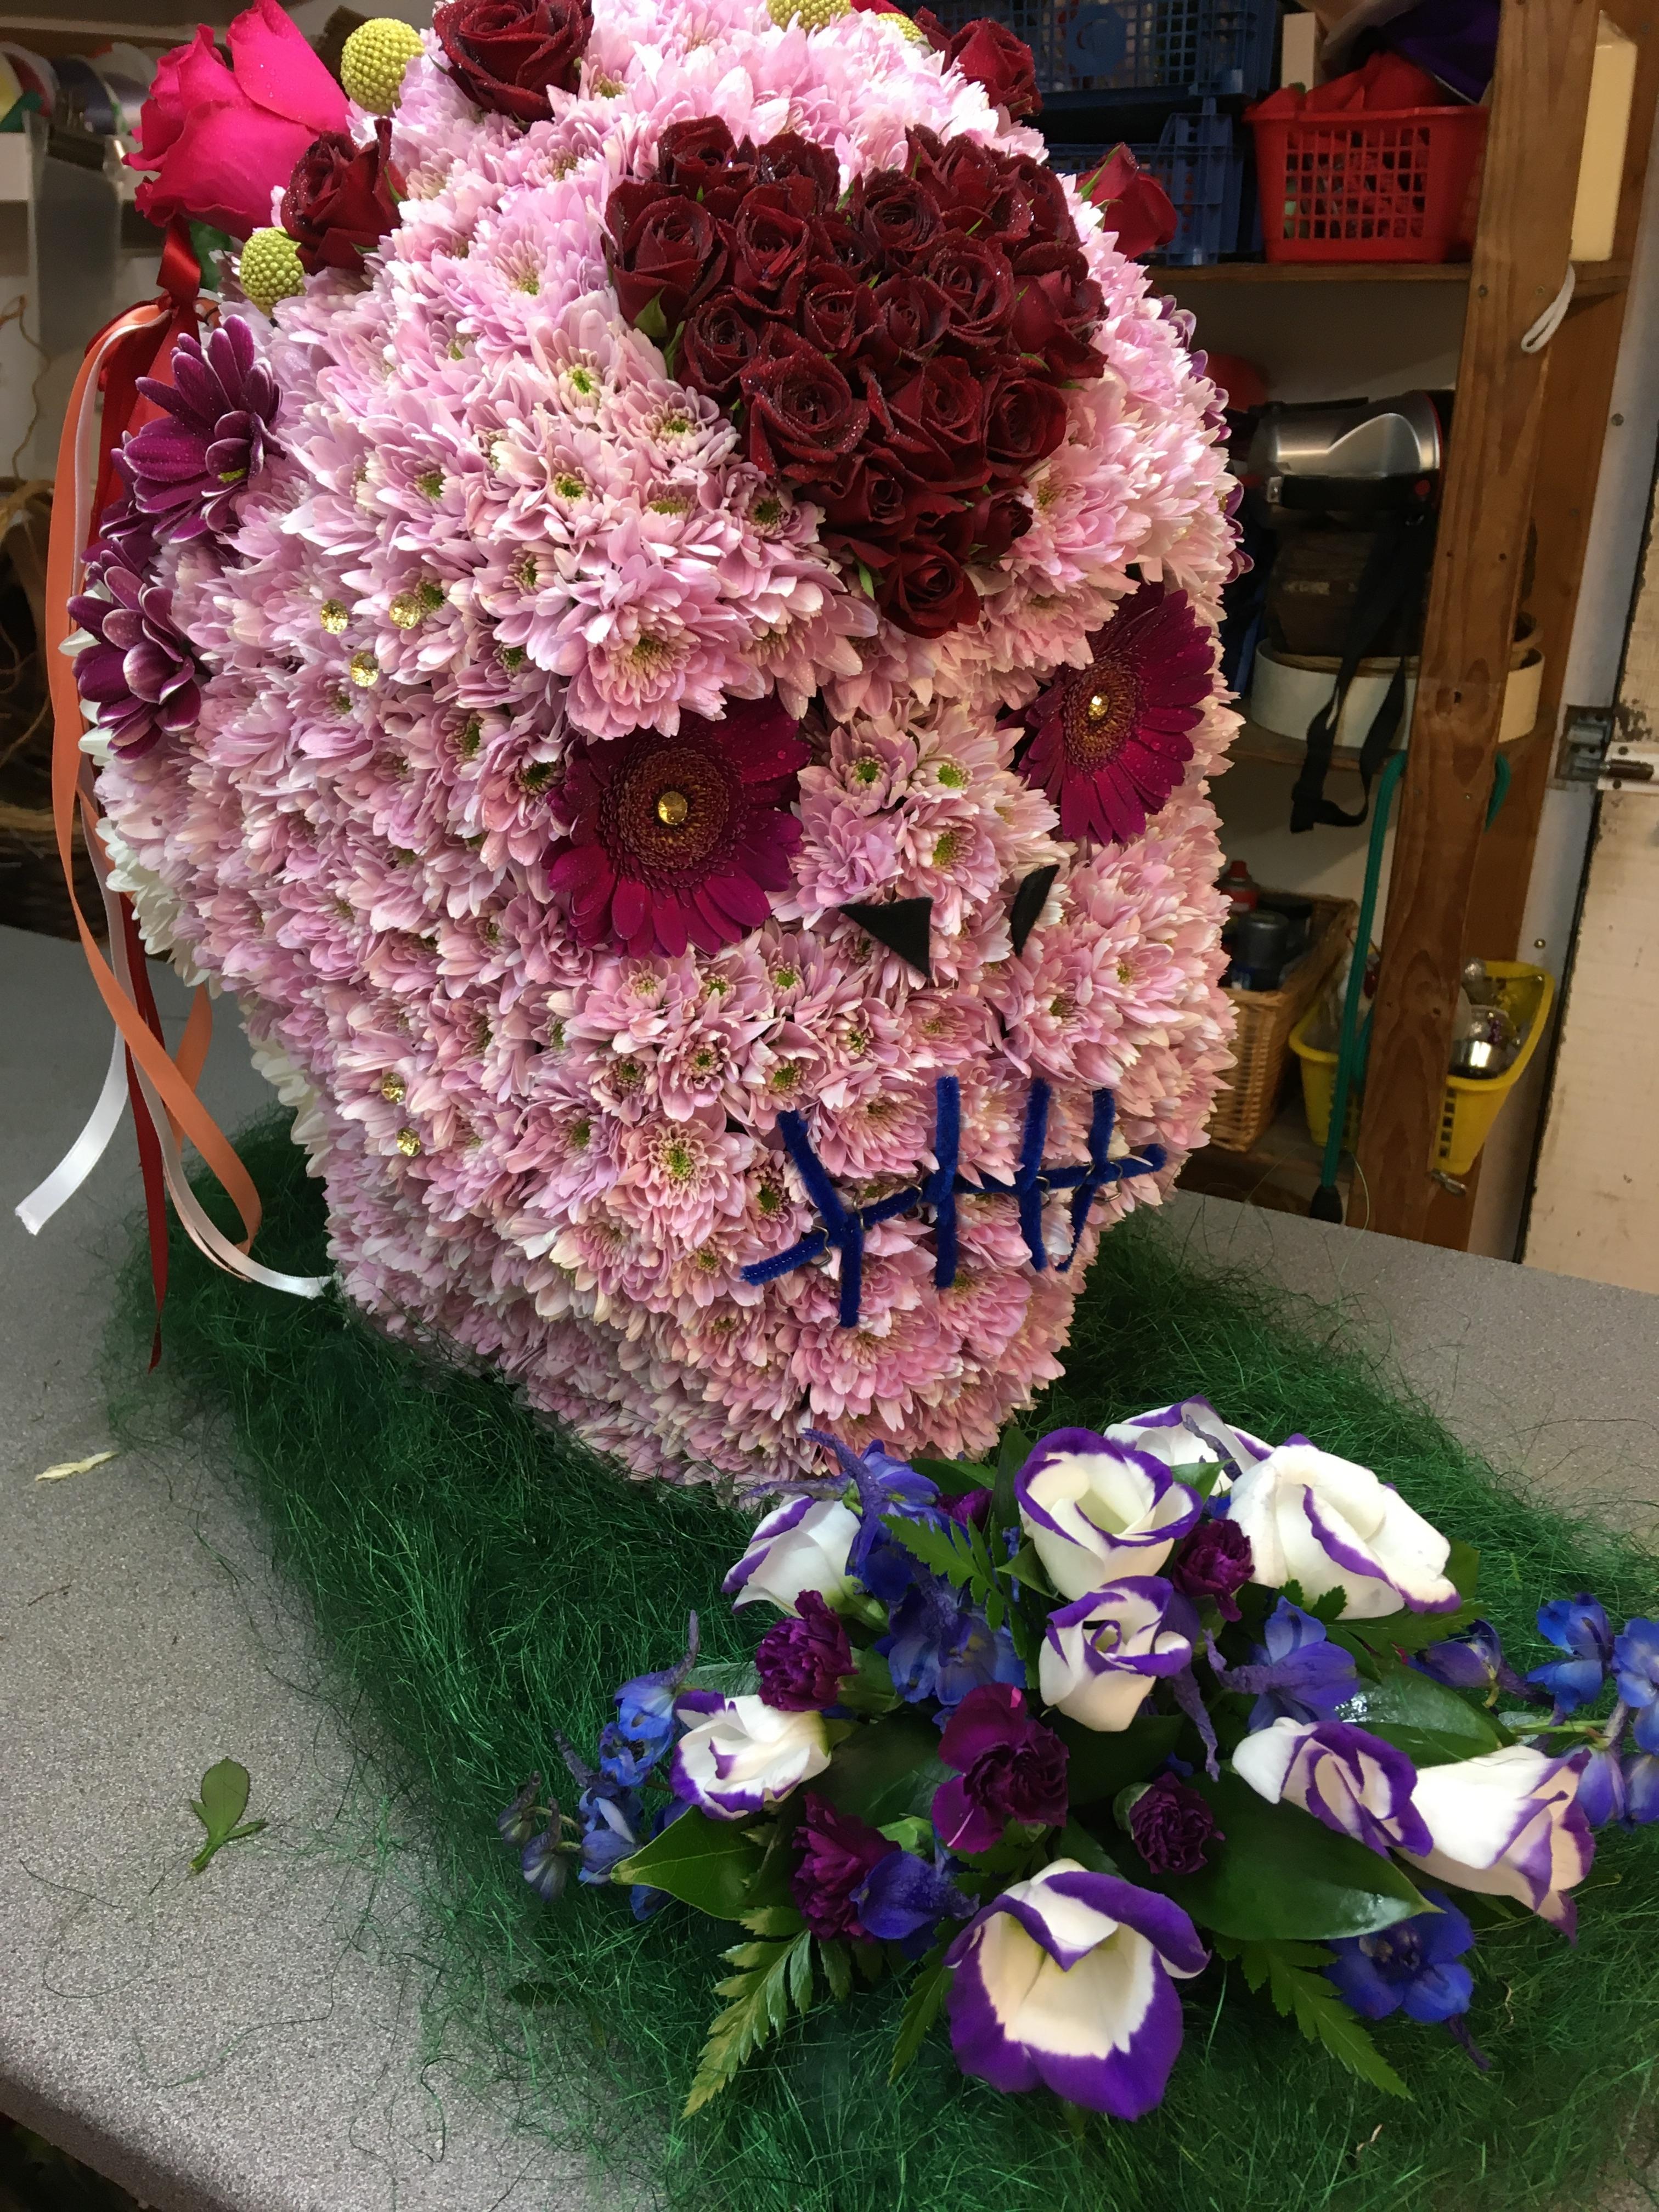 Skull made from flowers